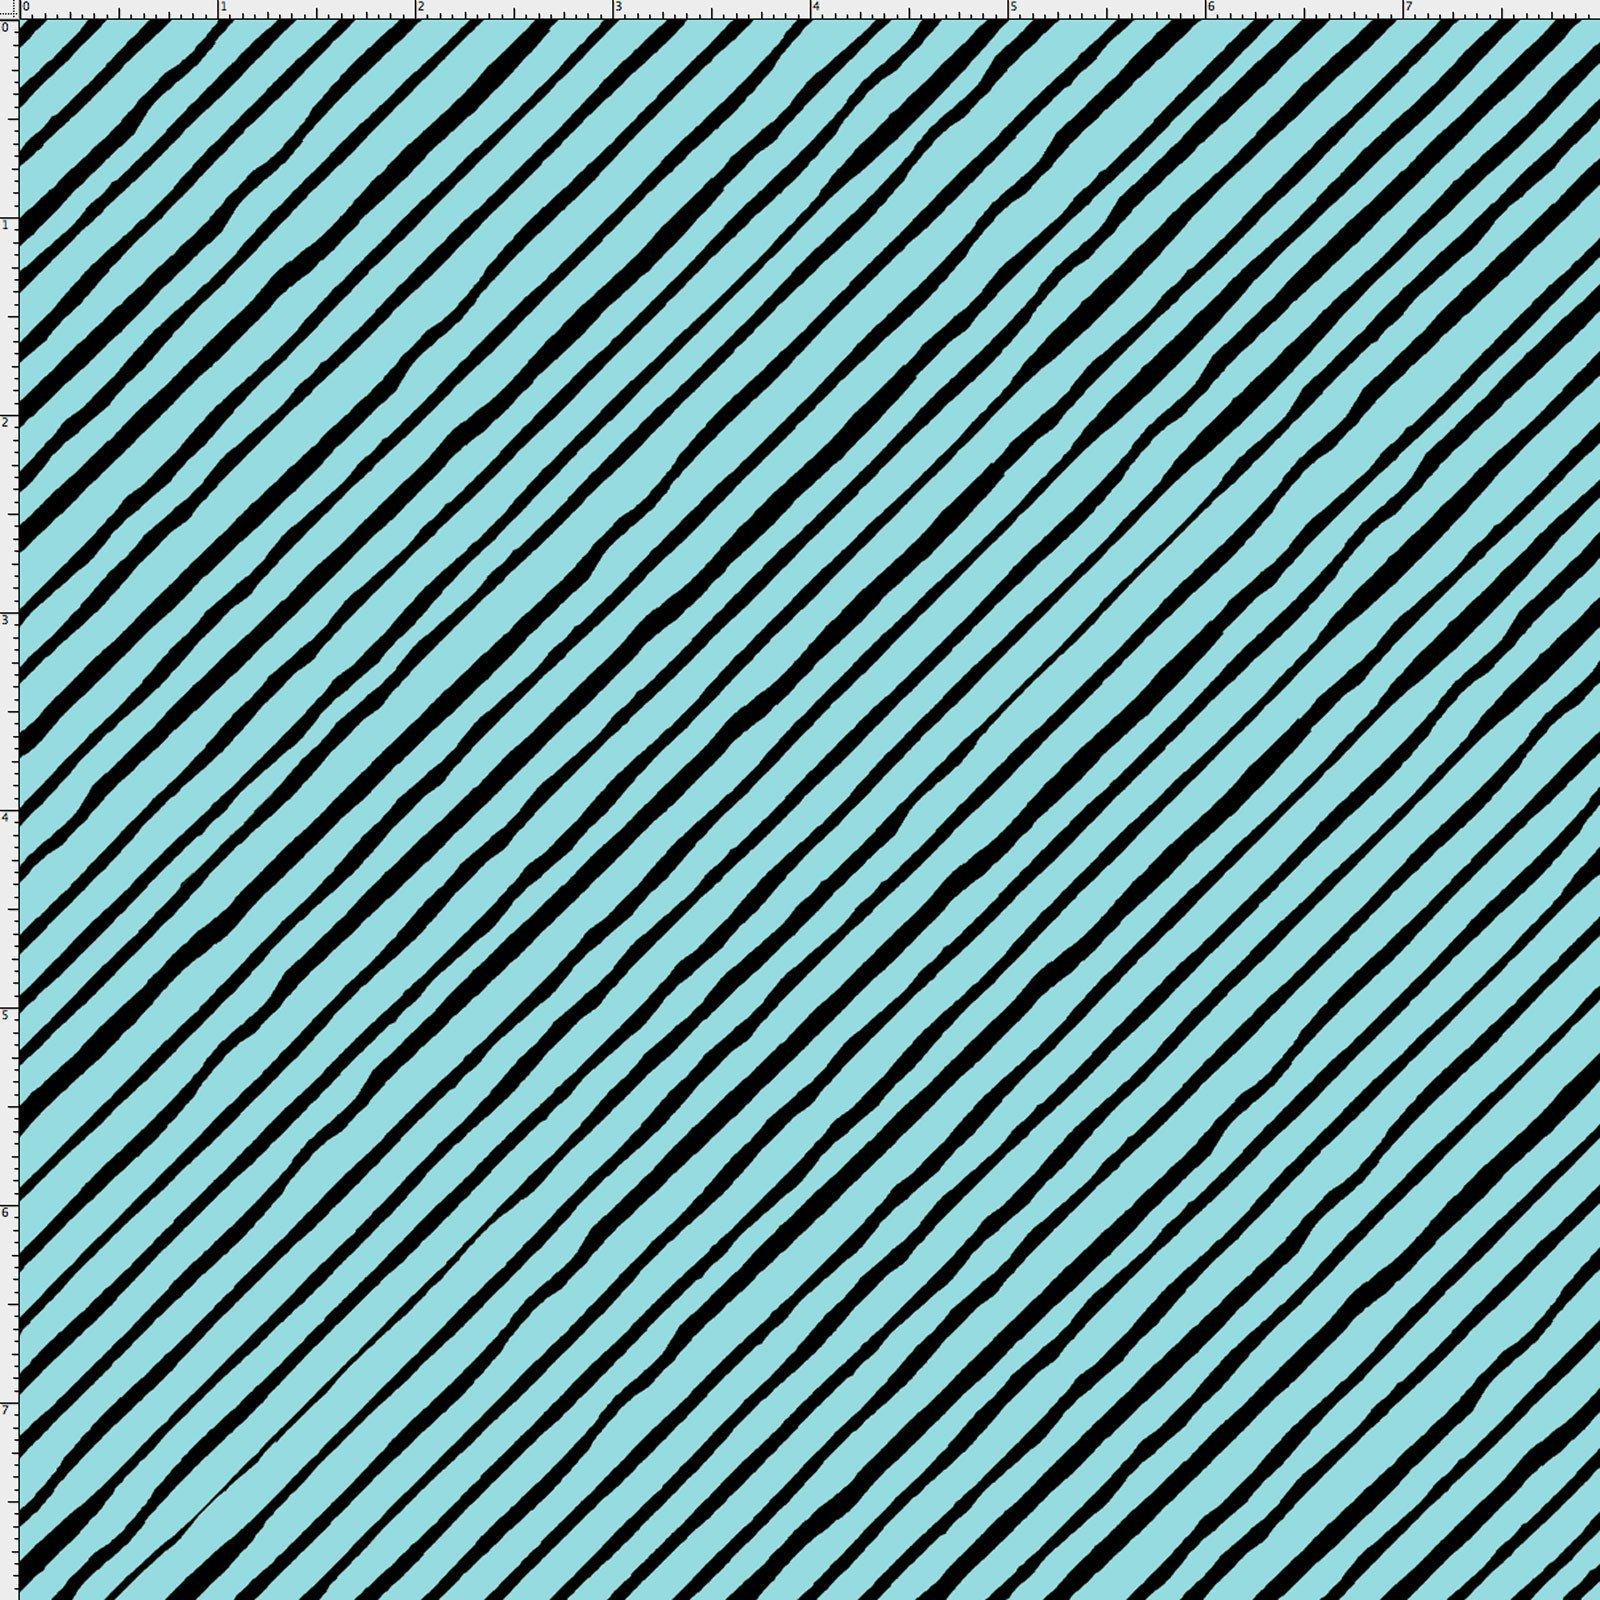 LD-Sorta Stripe Bias Turquoise/Black 692-191